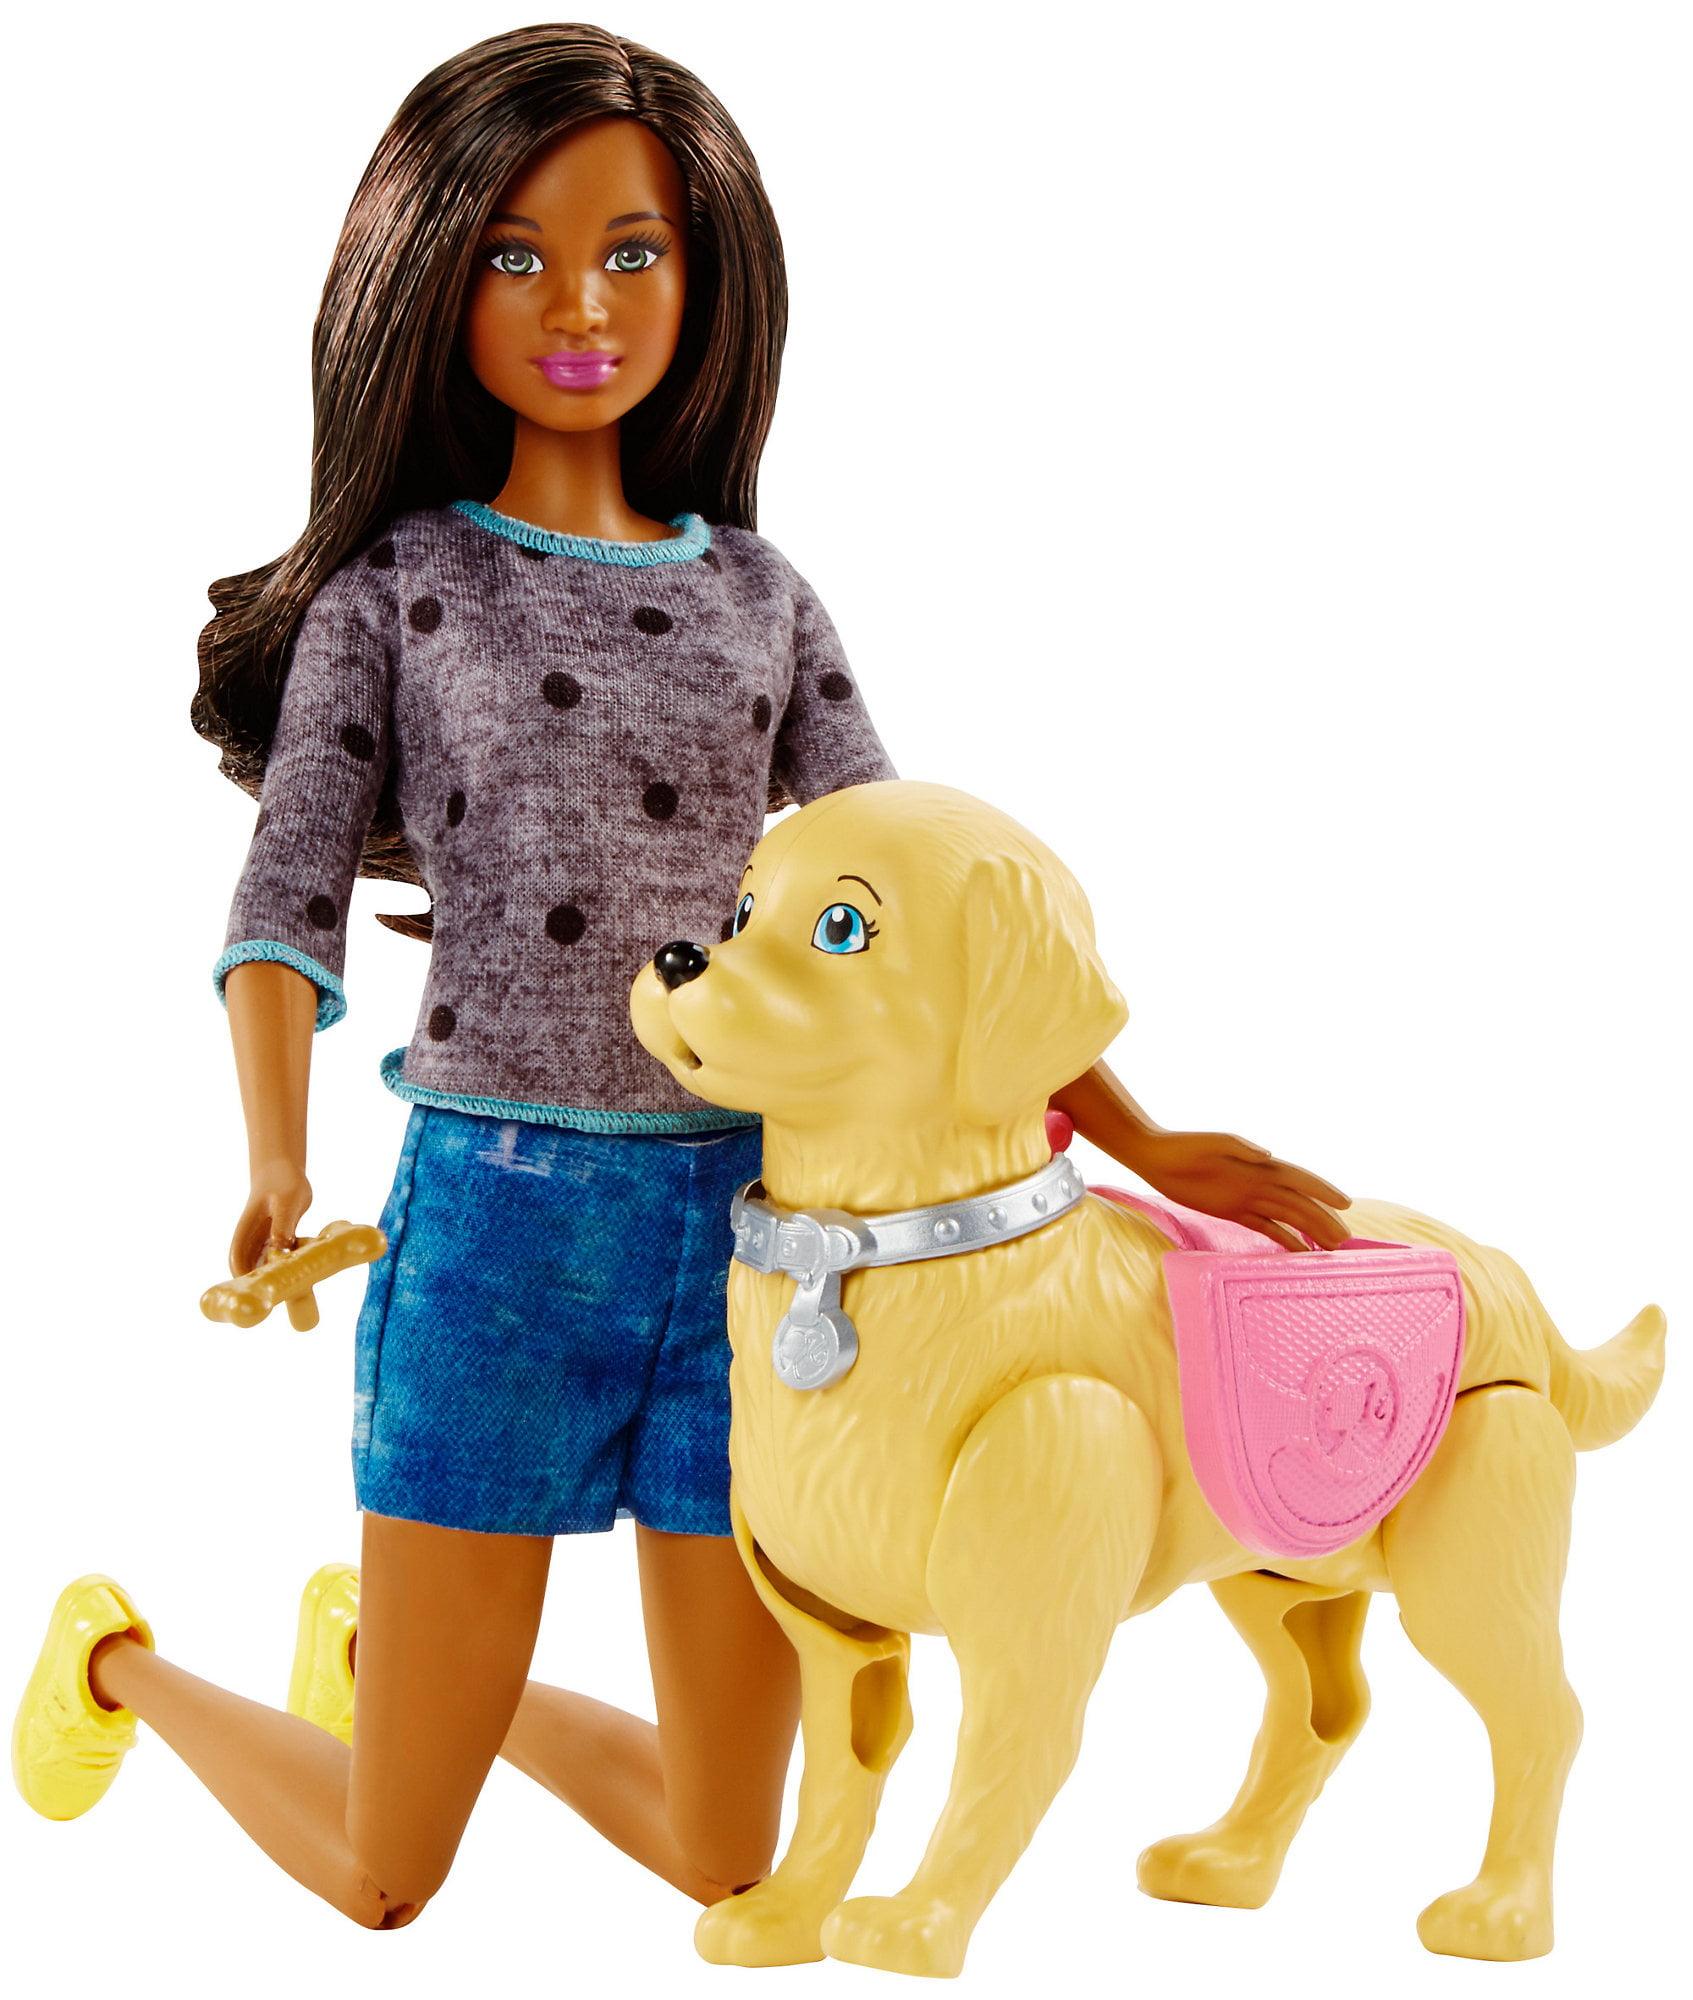 Barbie Walk & Potty Pup Nikki Doll by Mattel